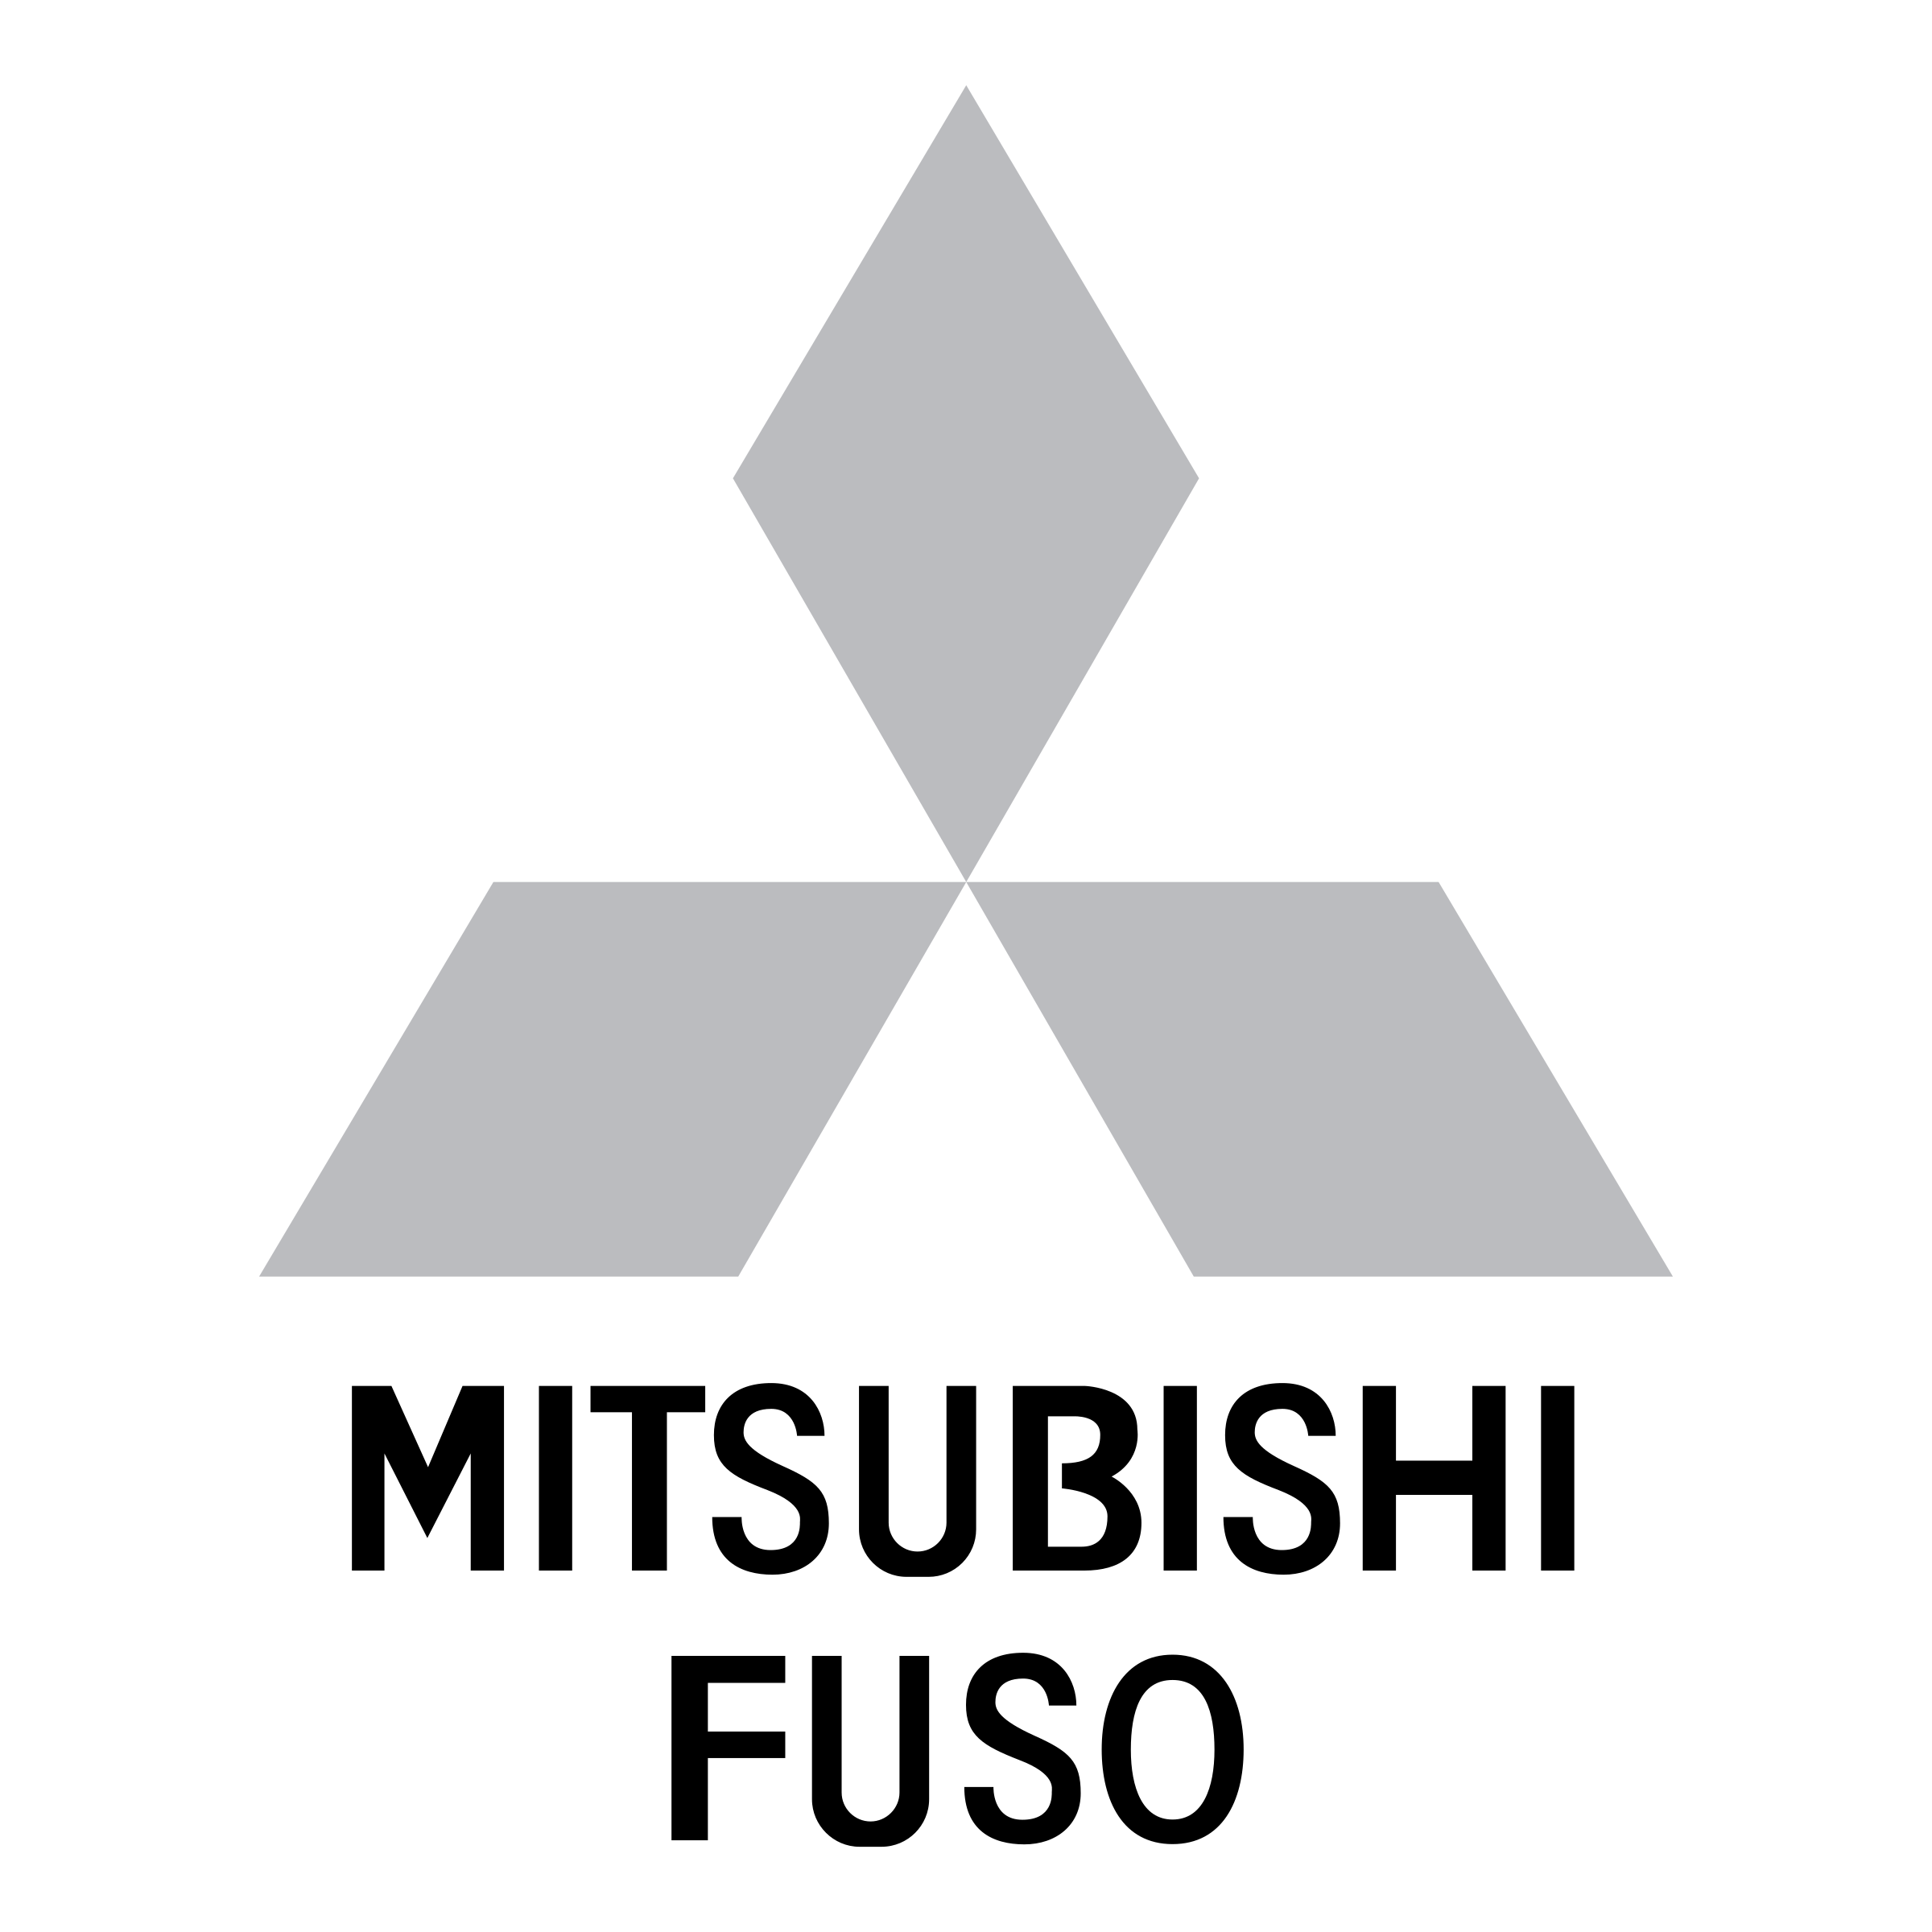 Mitsubishi Fuso Logo PNG Transparent & SVG Vector.